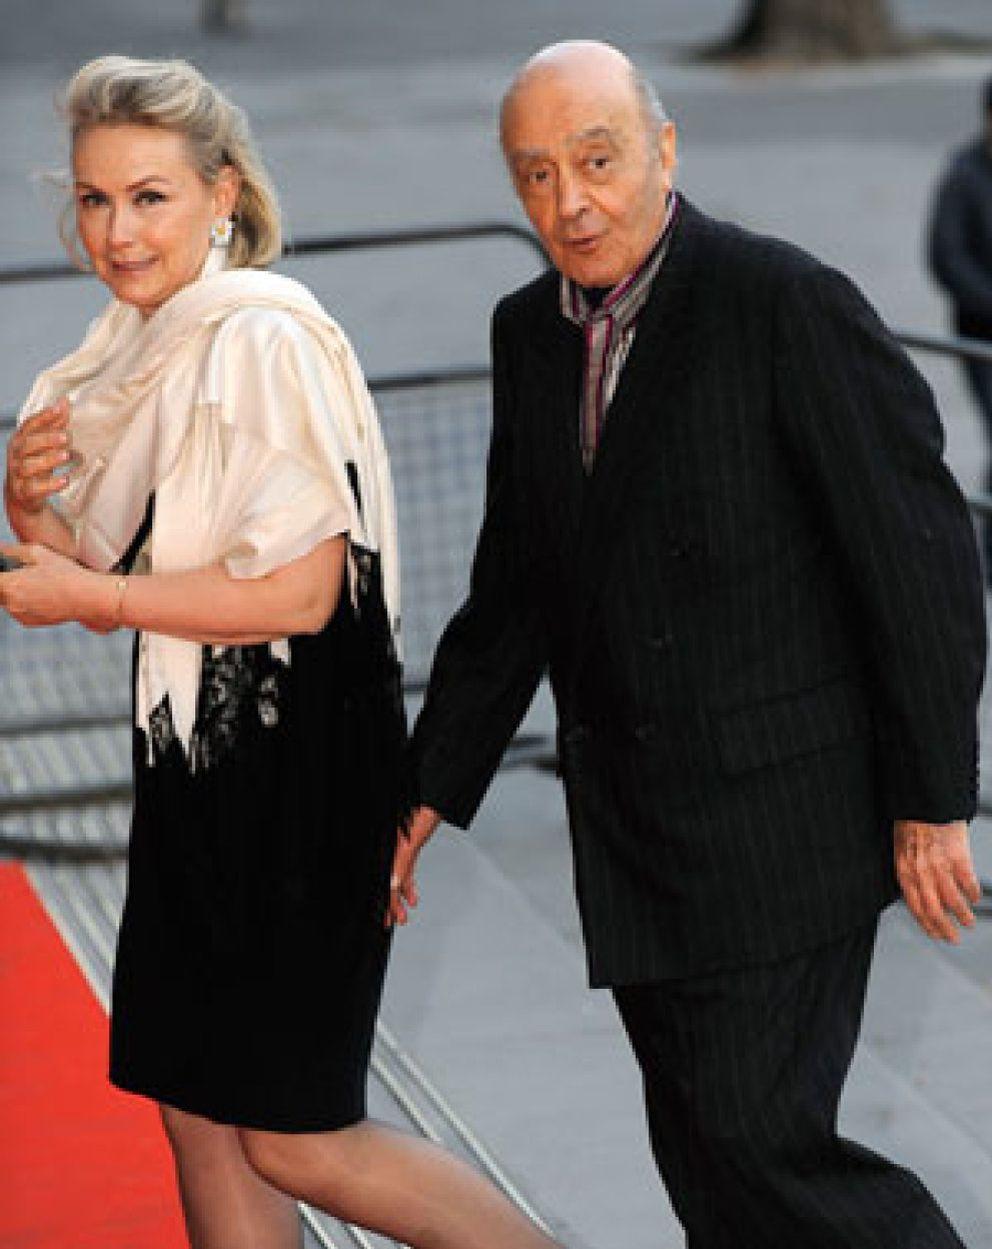 Foto: Al Fayed vende Harrods y se retira